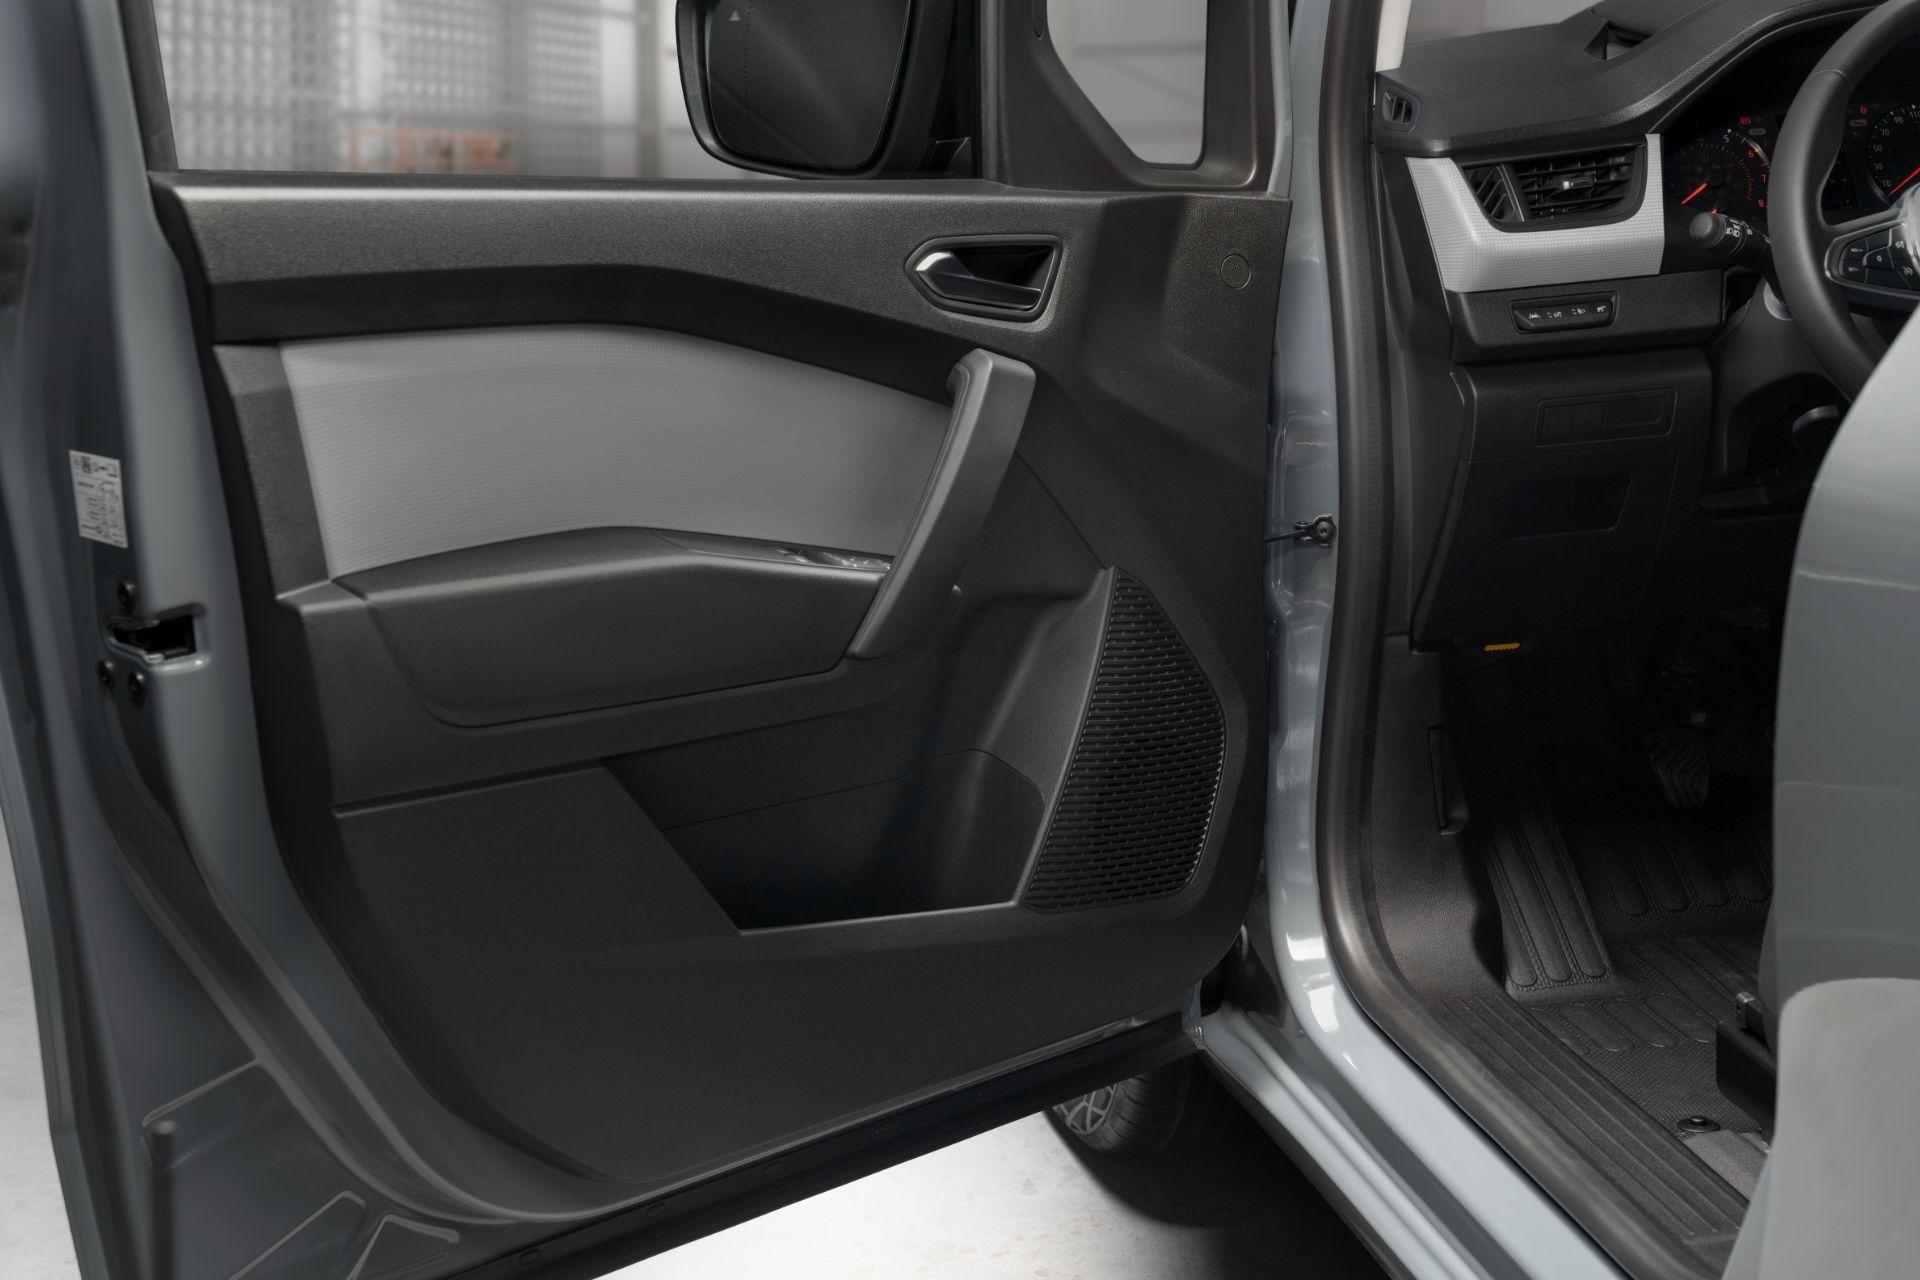 2022-Nissan-Townstar-petrol-van-dynamic-20